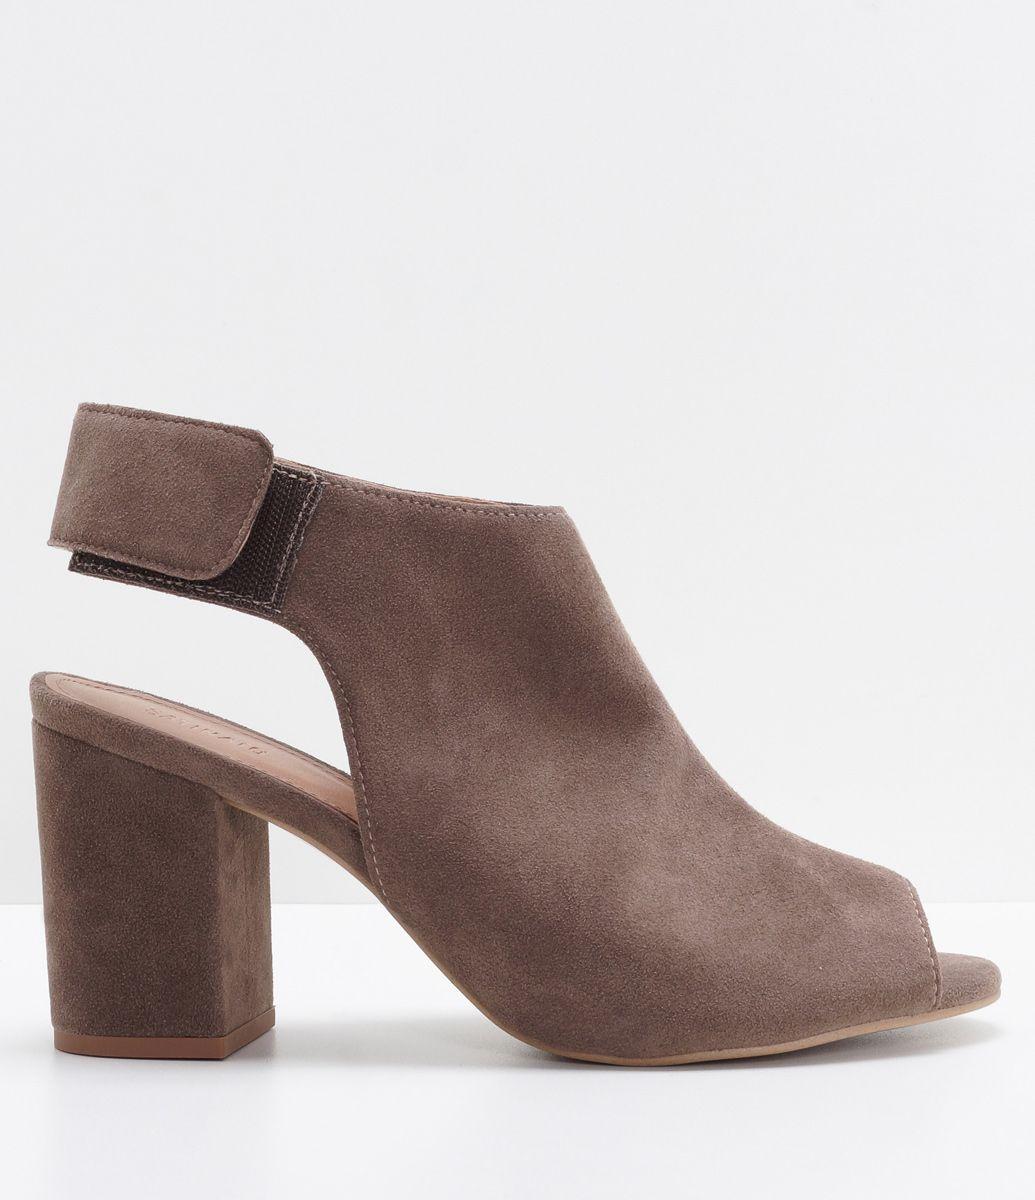 Compre Elegante De Camurça Sintética Patchwork Sandálias De